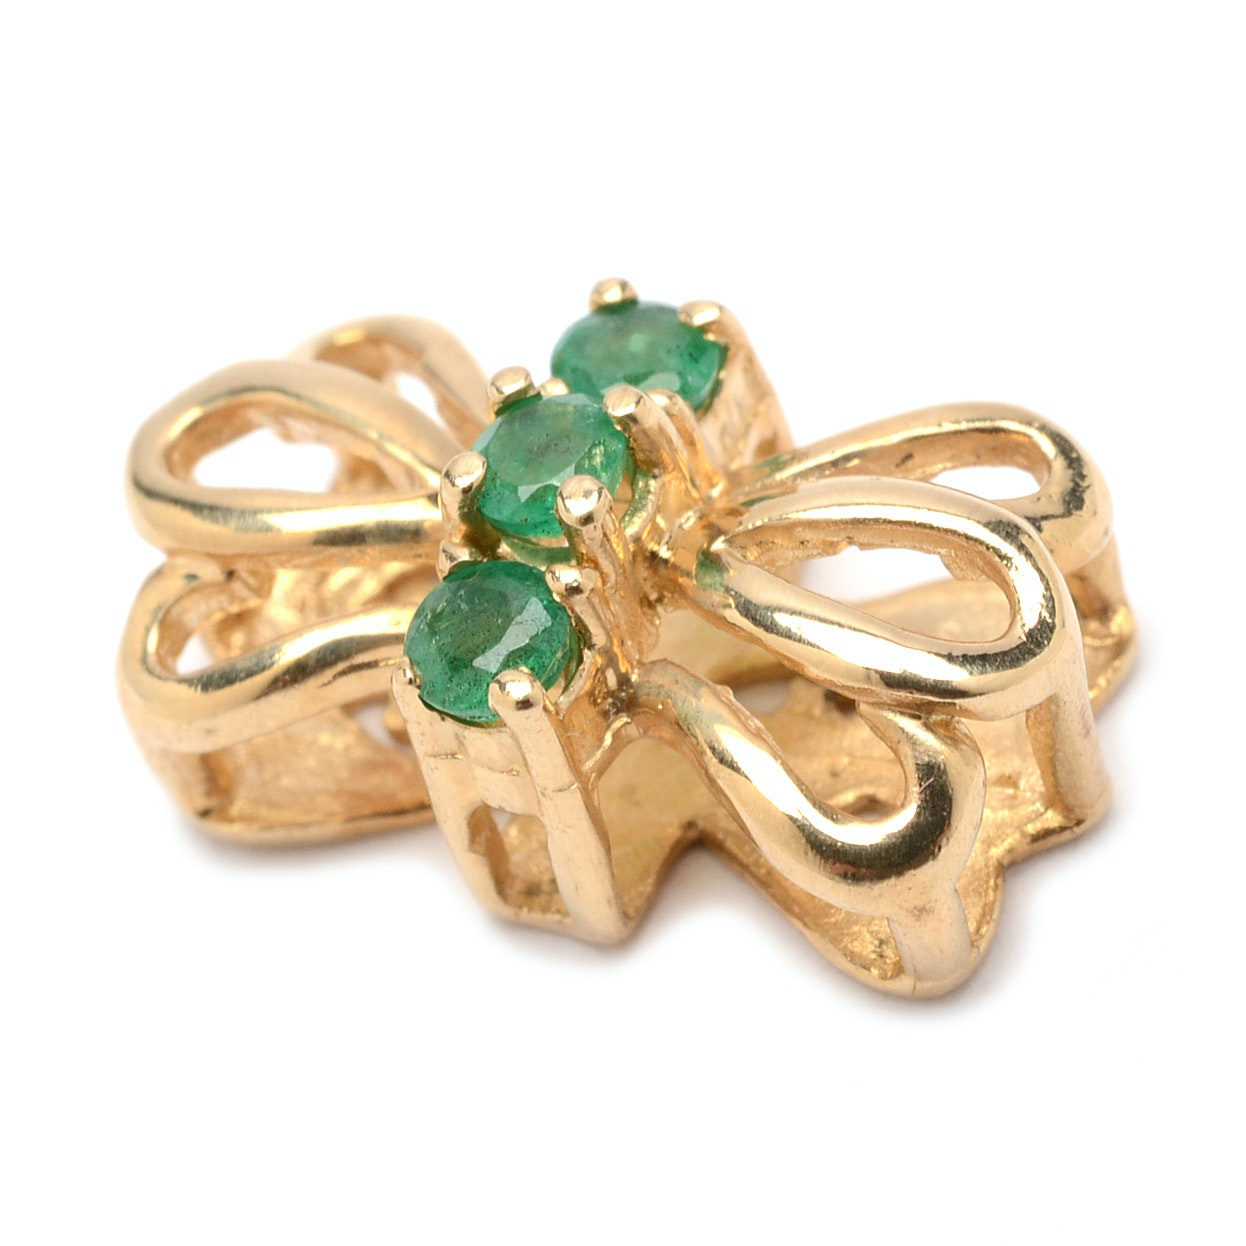 Alwand Vahan 14K Yellow Gold Emerald Slide Pendant Charm